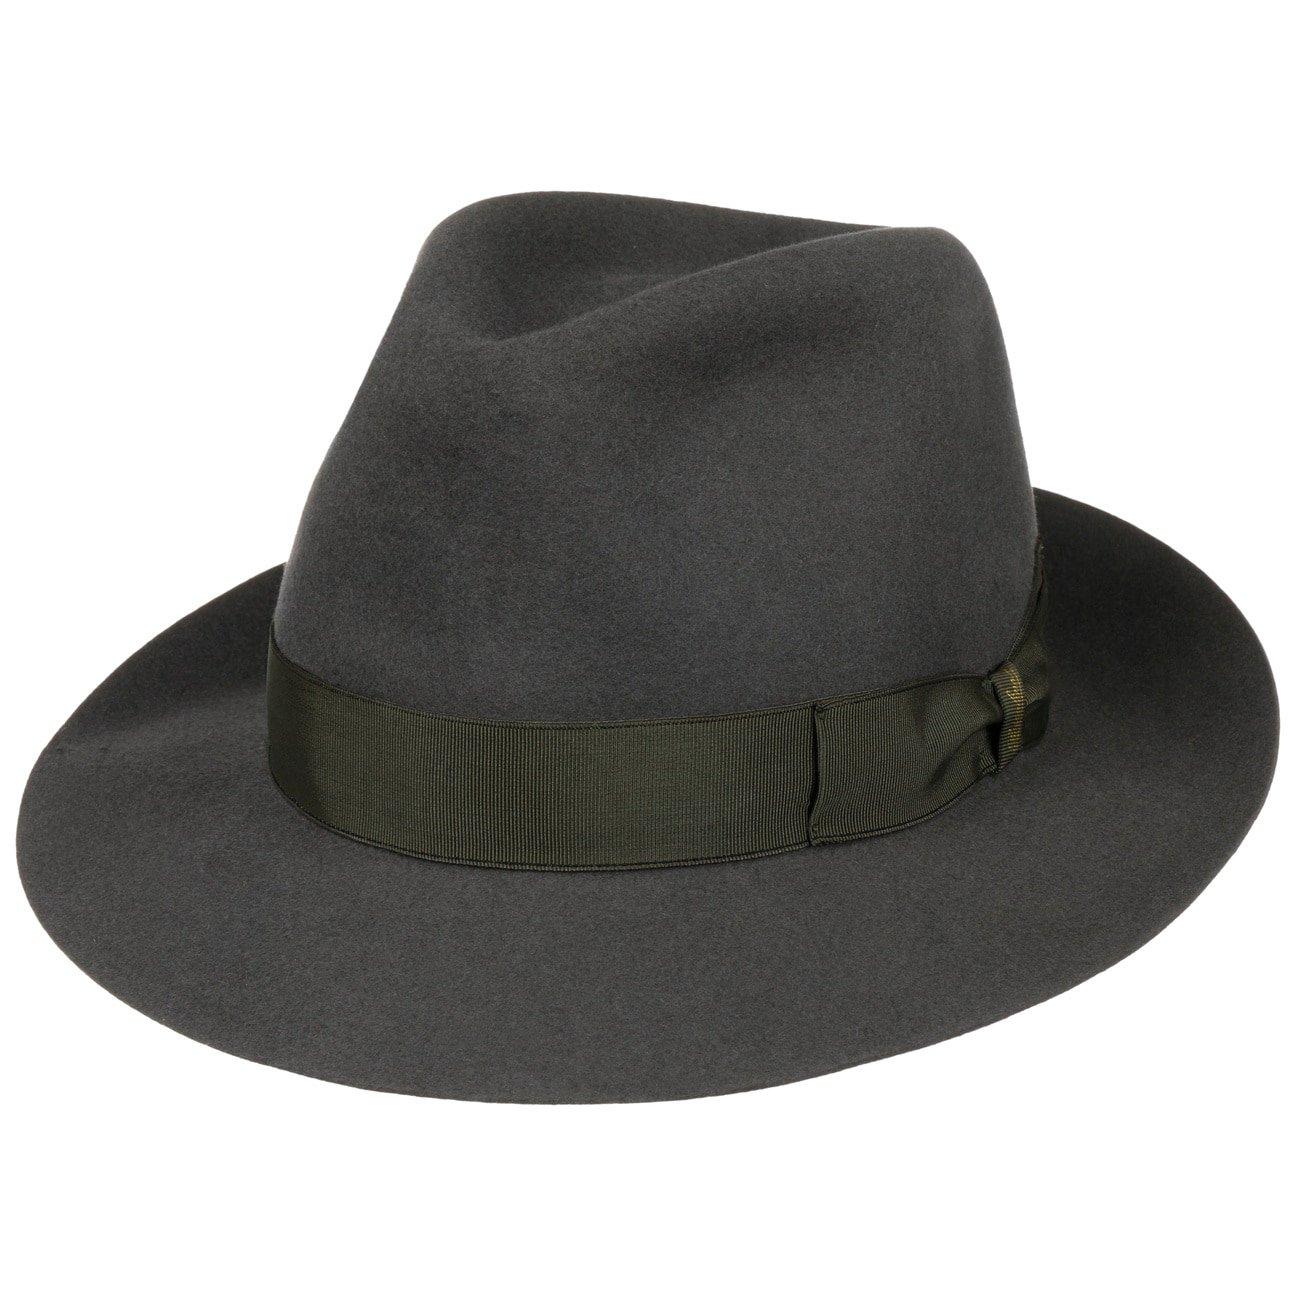 ... 50 Grams Men´s Fedora Hat by Borsalino - grey 5 ... 1e84381d40d